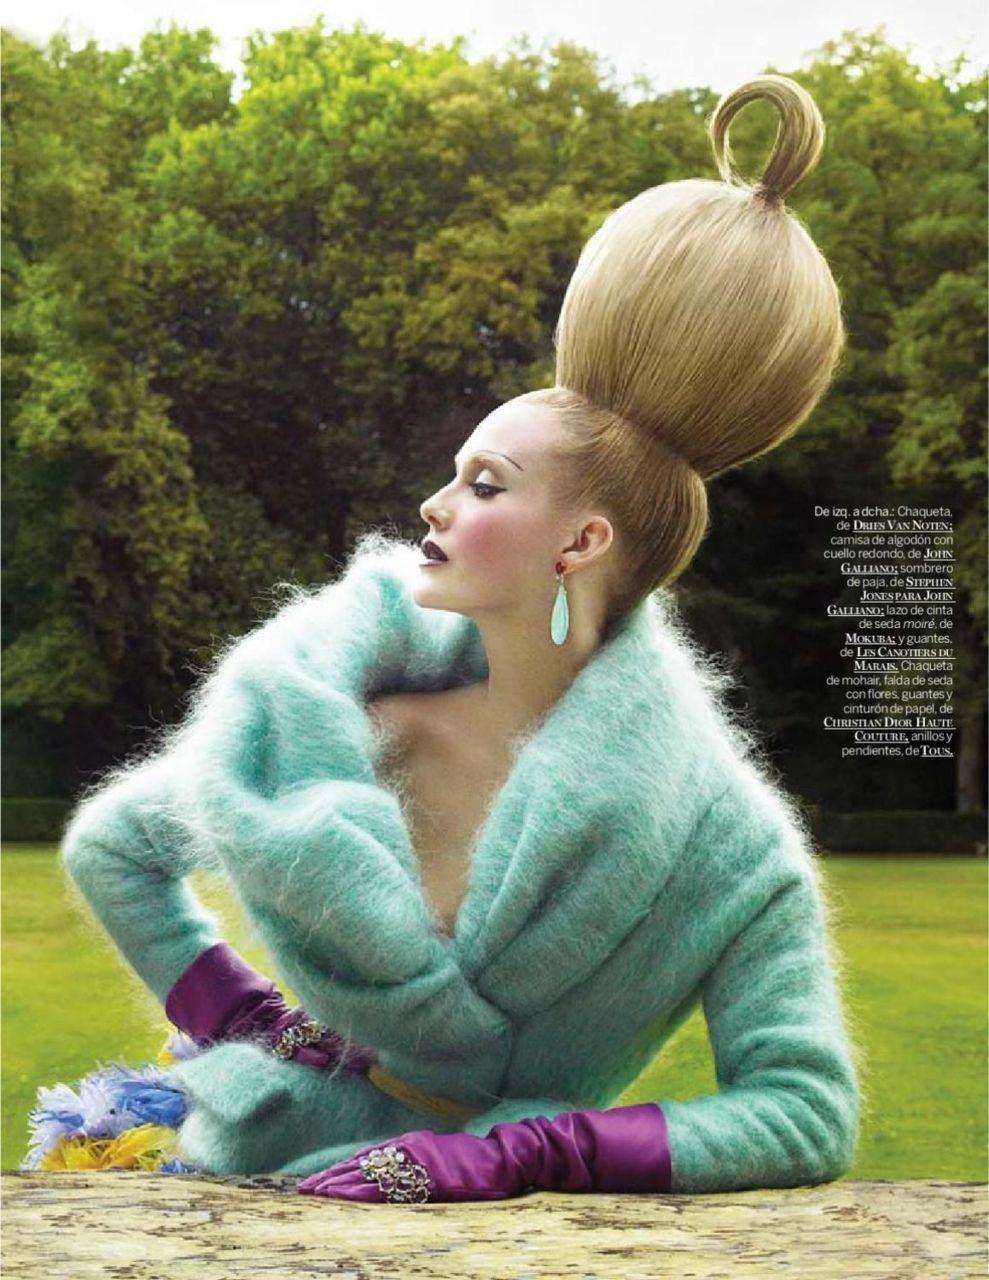 Ruven Afanador for Vogue Italia.  Seafoam angora sweater.  Violet satin gloves.  Editorial.